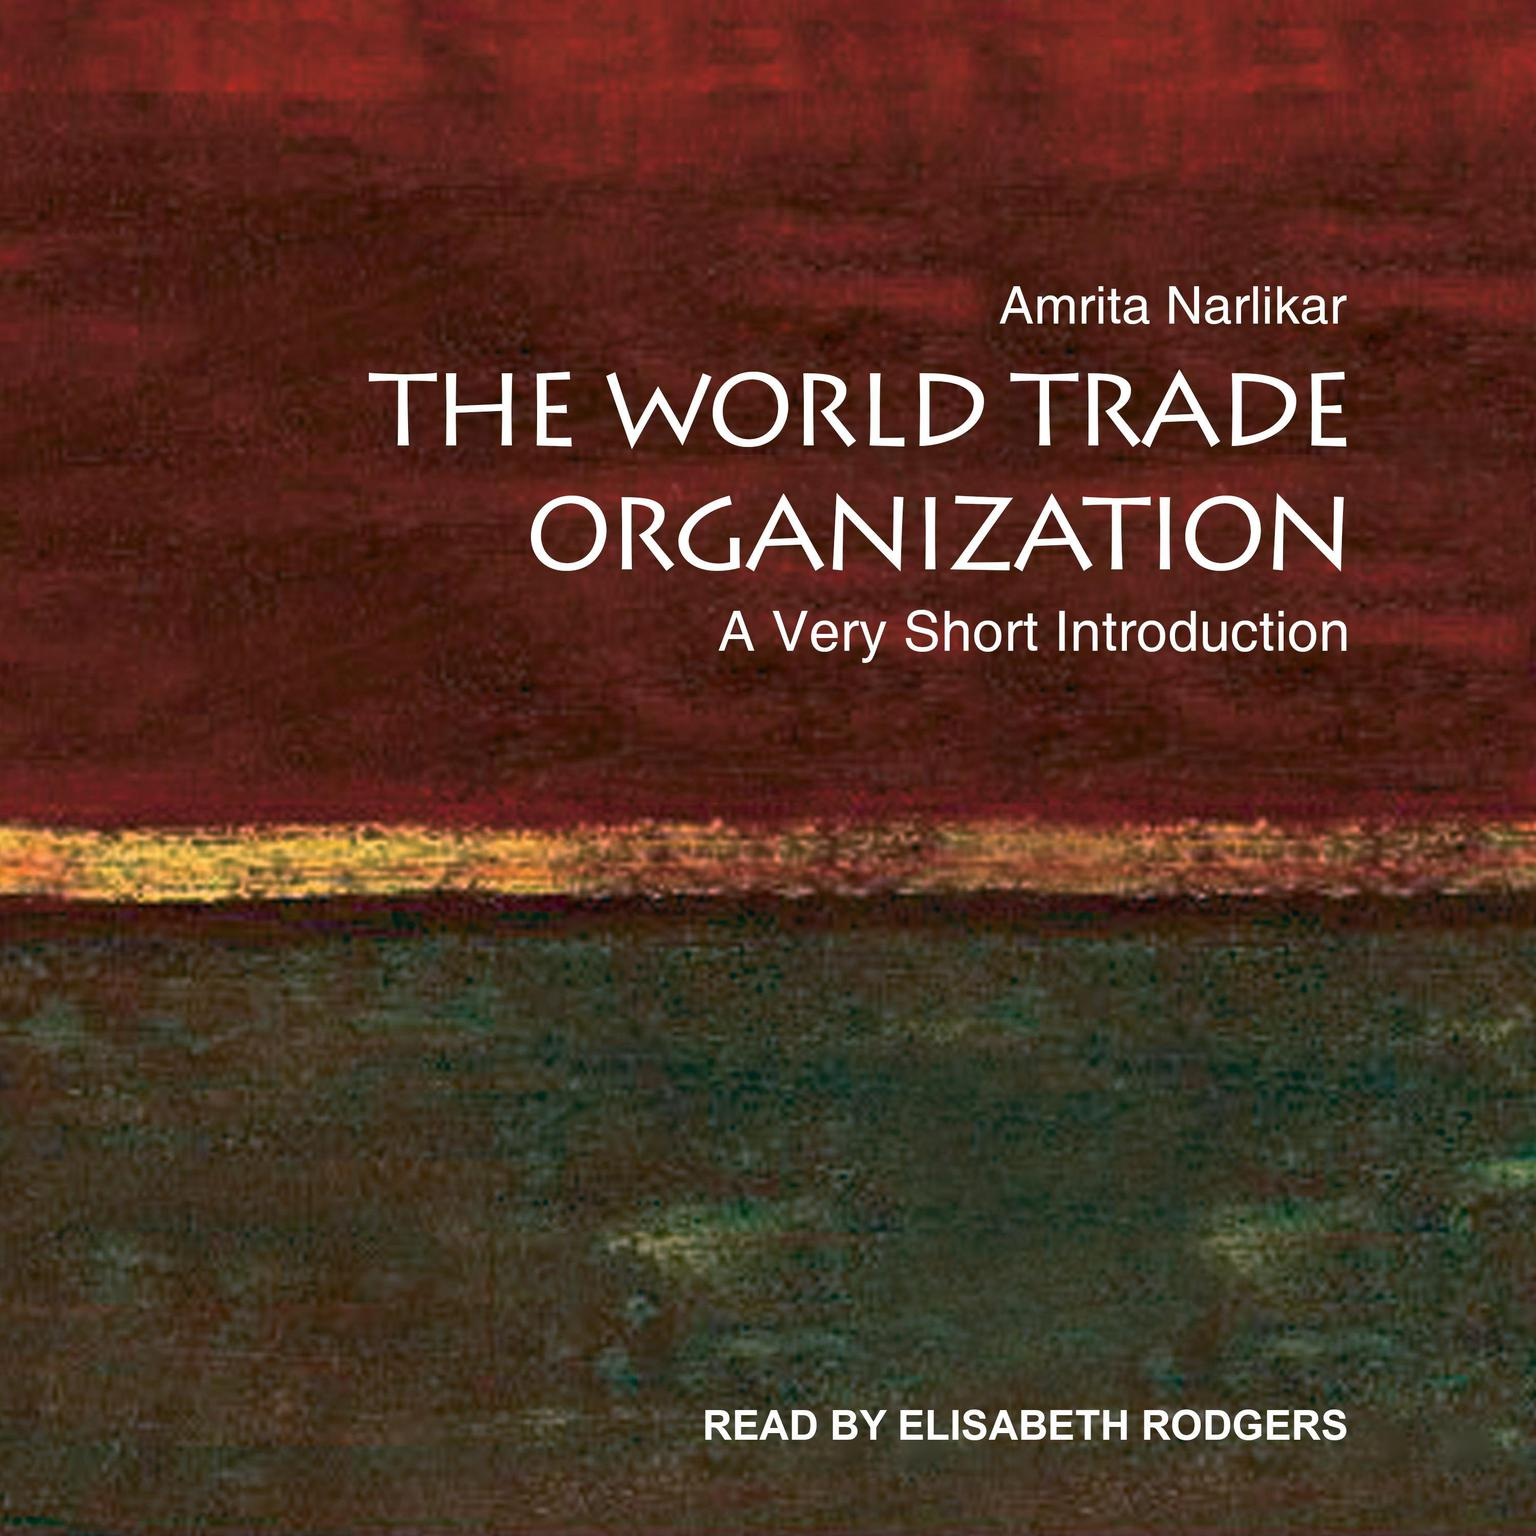 The World Trade Organization: A Very Short Introduction Audiobook, by Amrita Narlikar